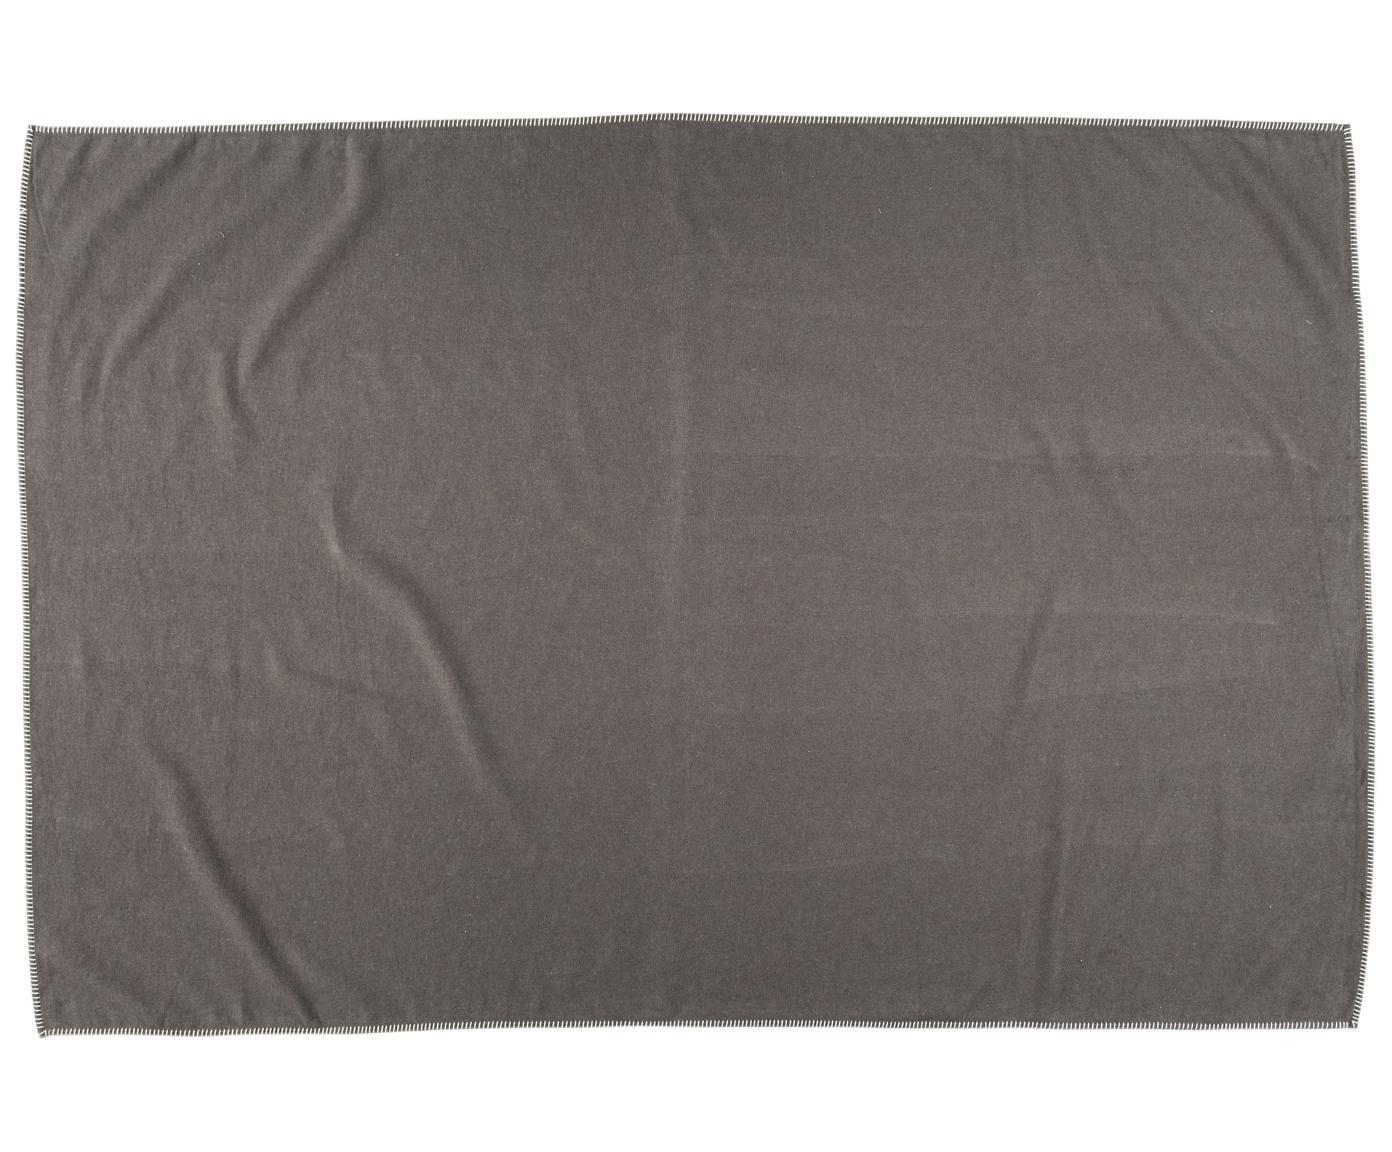 Fleece-Plaid Sylt in Taupe mit Steppnaht, Webart: Jacquard, Taupe, 140 x 200 cm